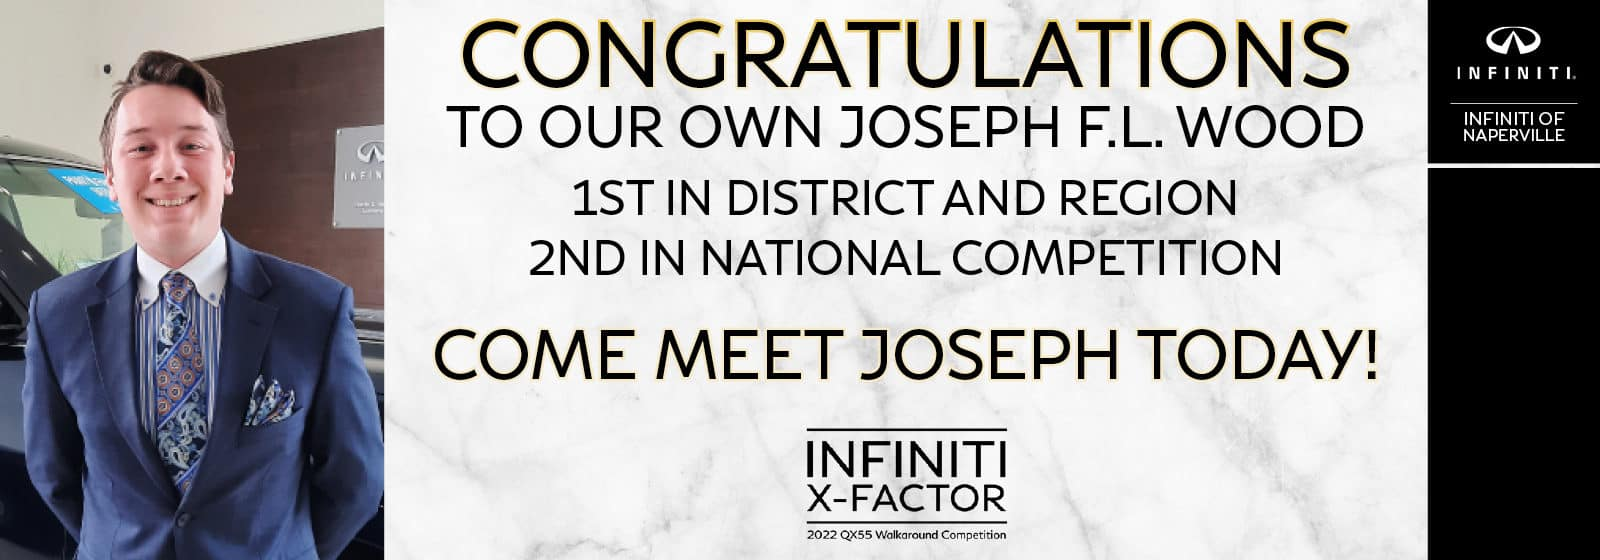 Congratulations | INFINITI of Naperville